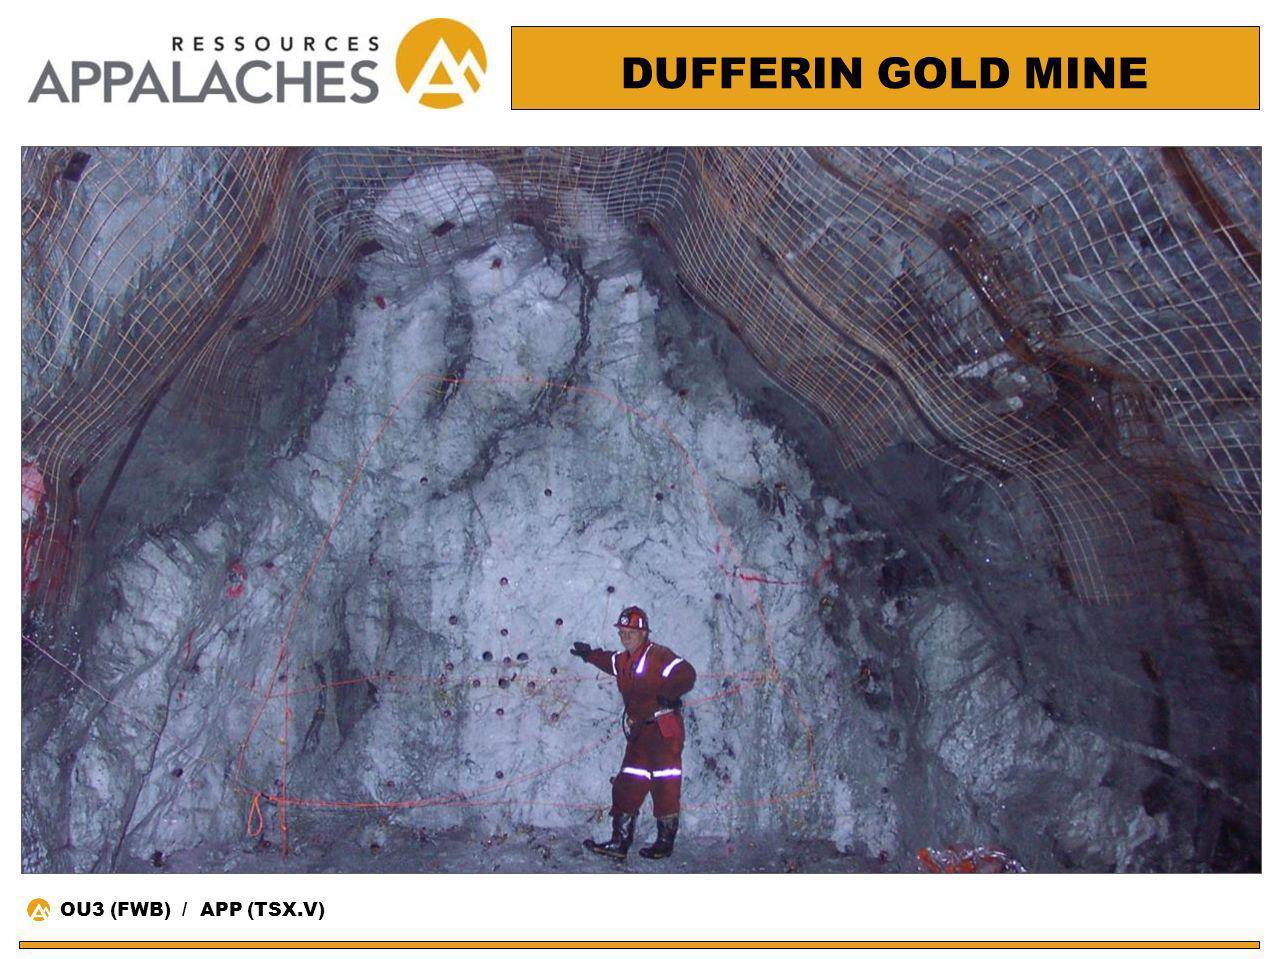 DUFFERIN GOLD MINE OU3 (FWB) / APP (TSX.V)